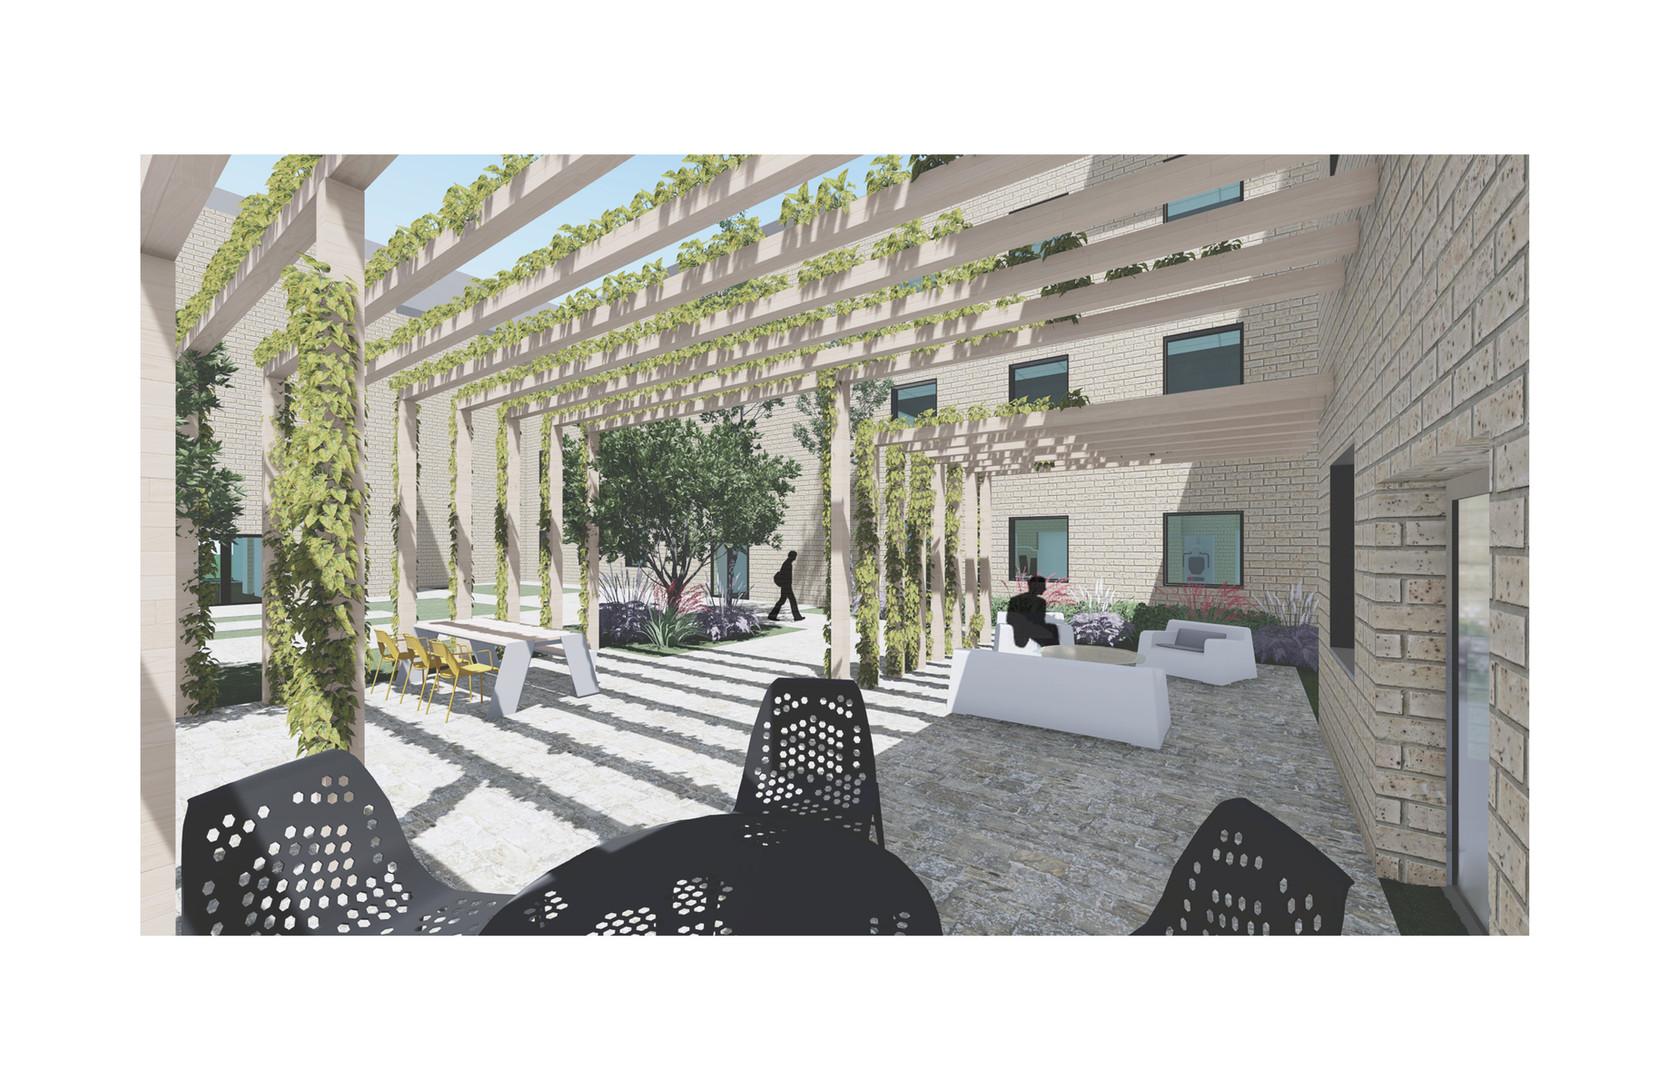 INTERIORS_IS4_WALKER_ courtyard.jpg